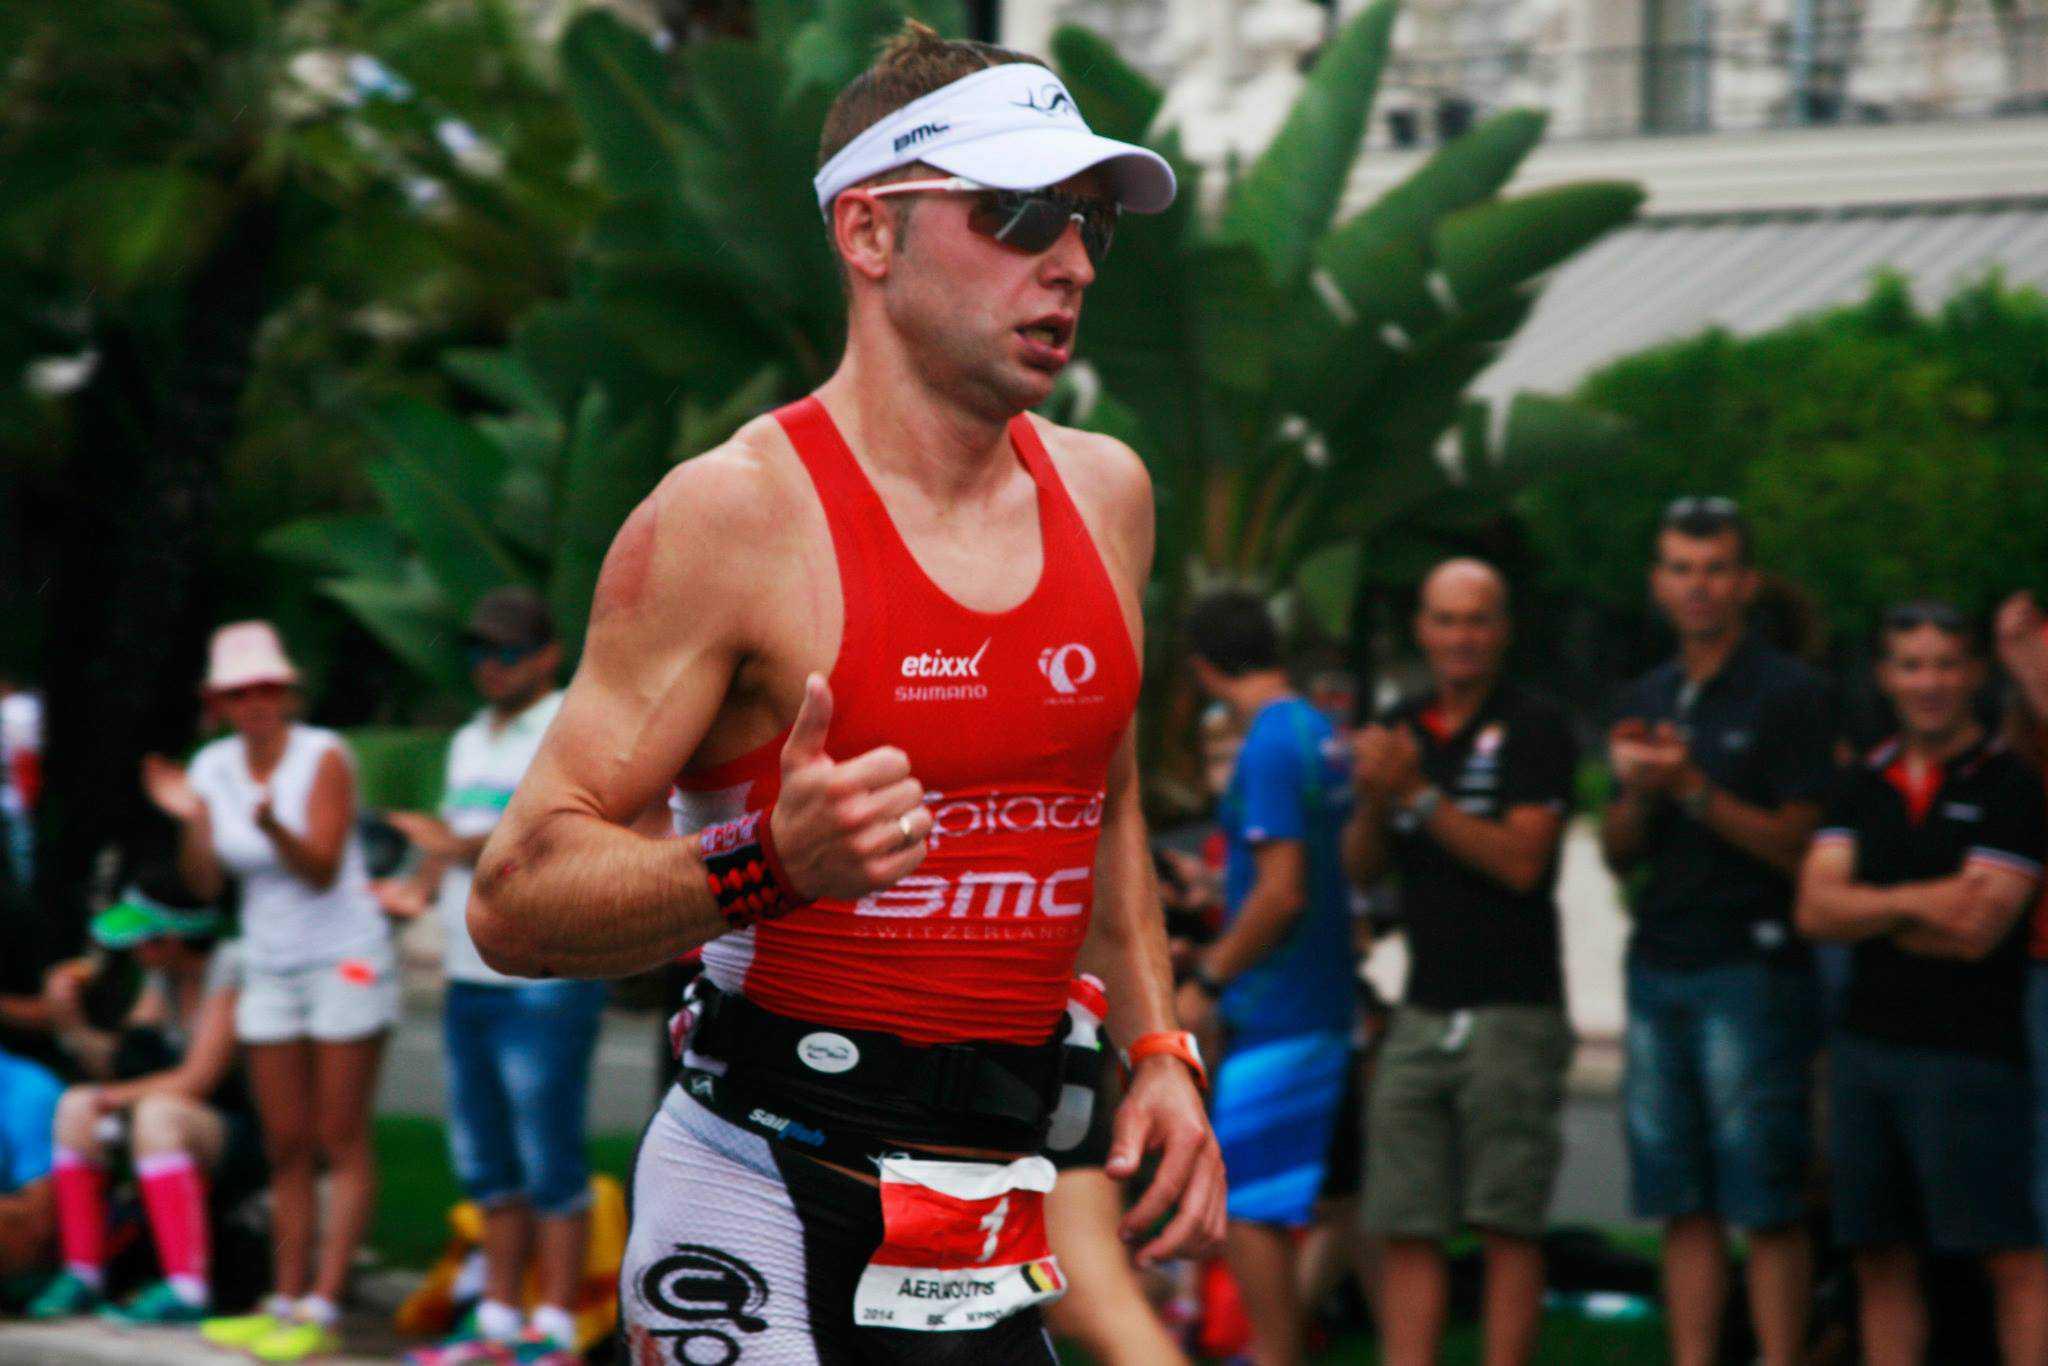 Bart Aernouts Europees kampioen 70.3